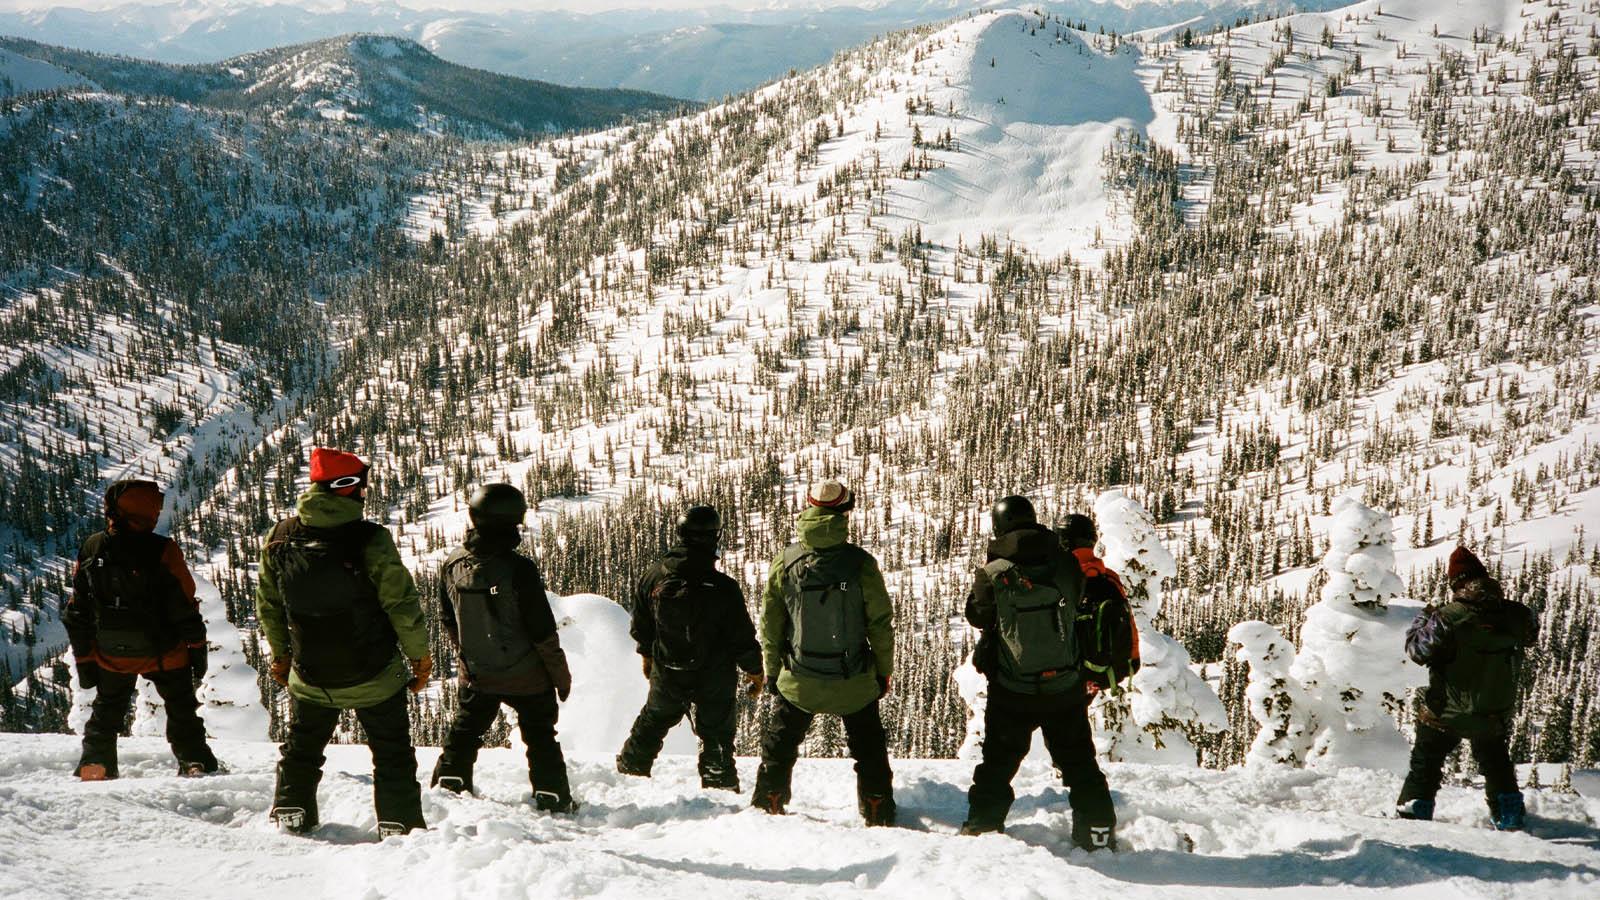 Union FW20/21 Snowboard Bindings